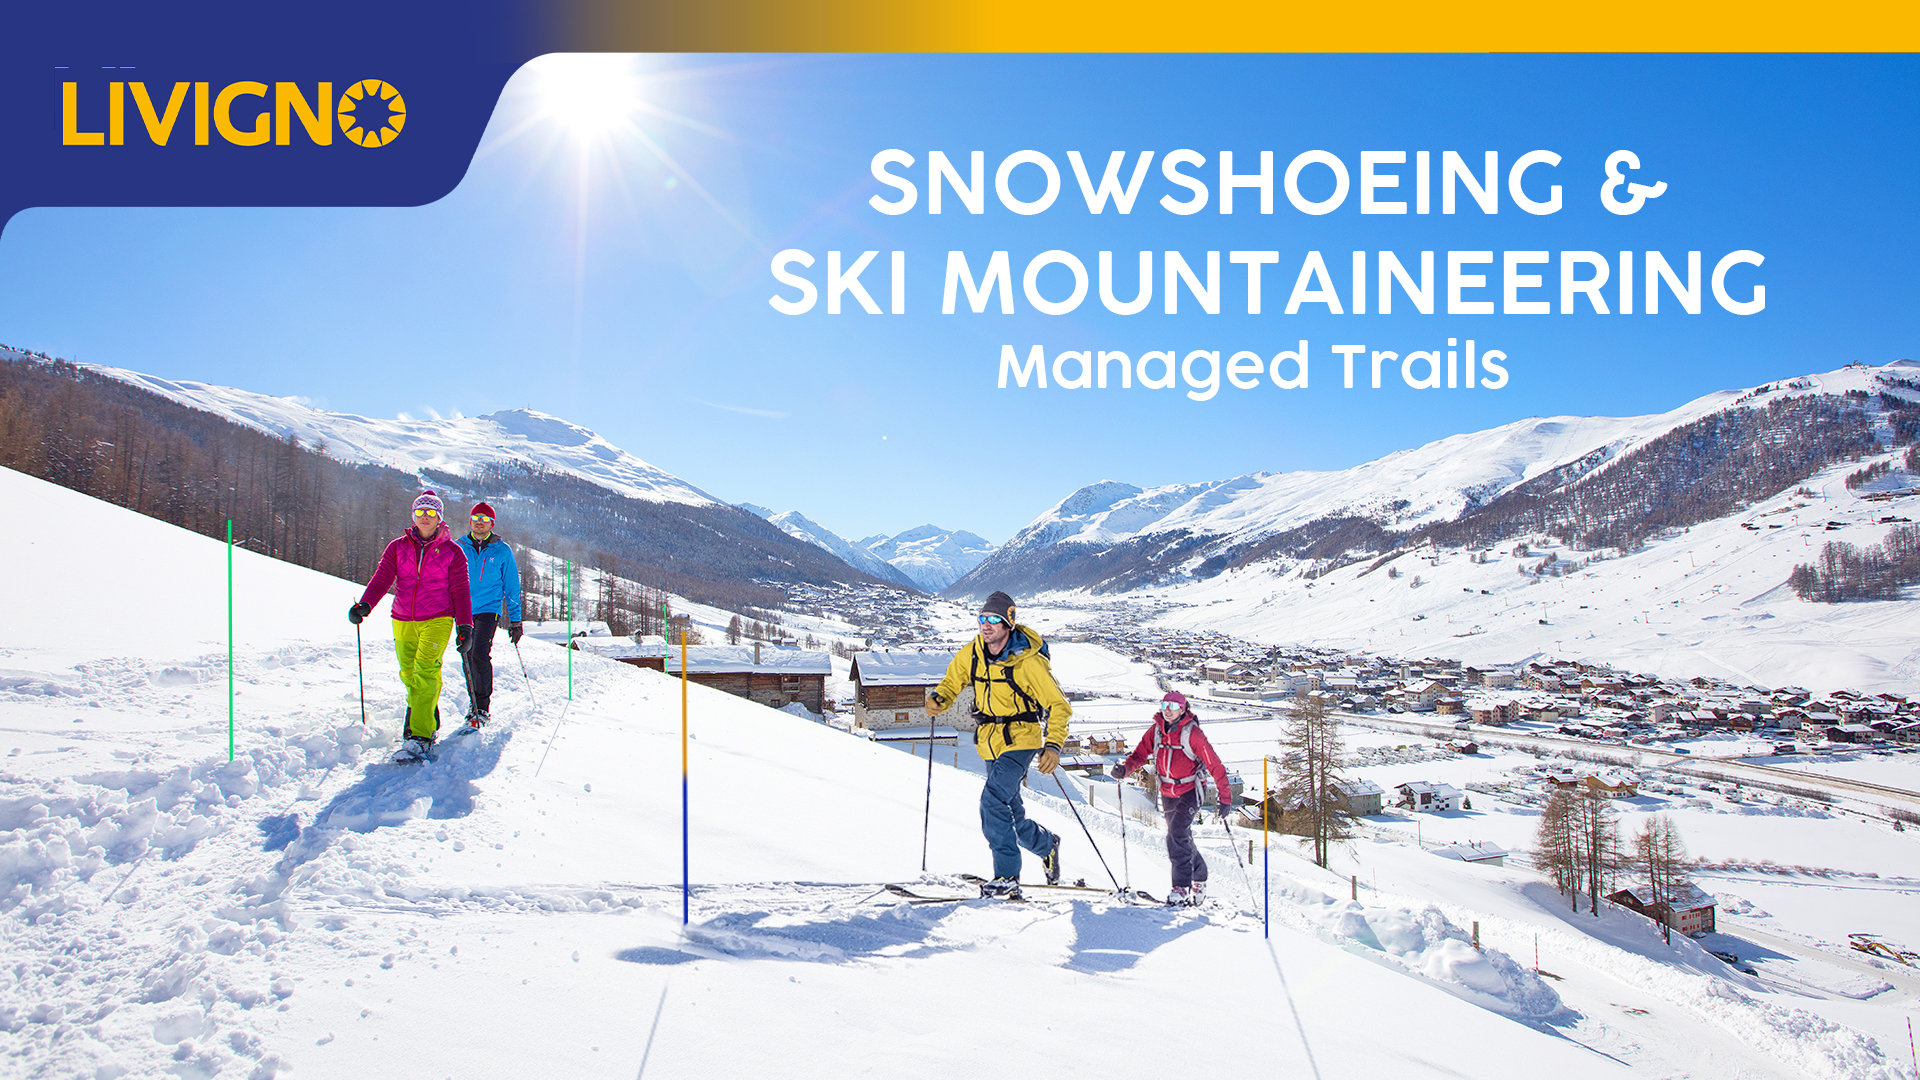 snowshoe, ski mountaineering